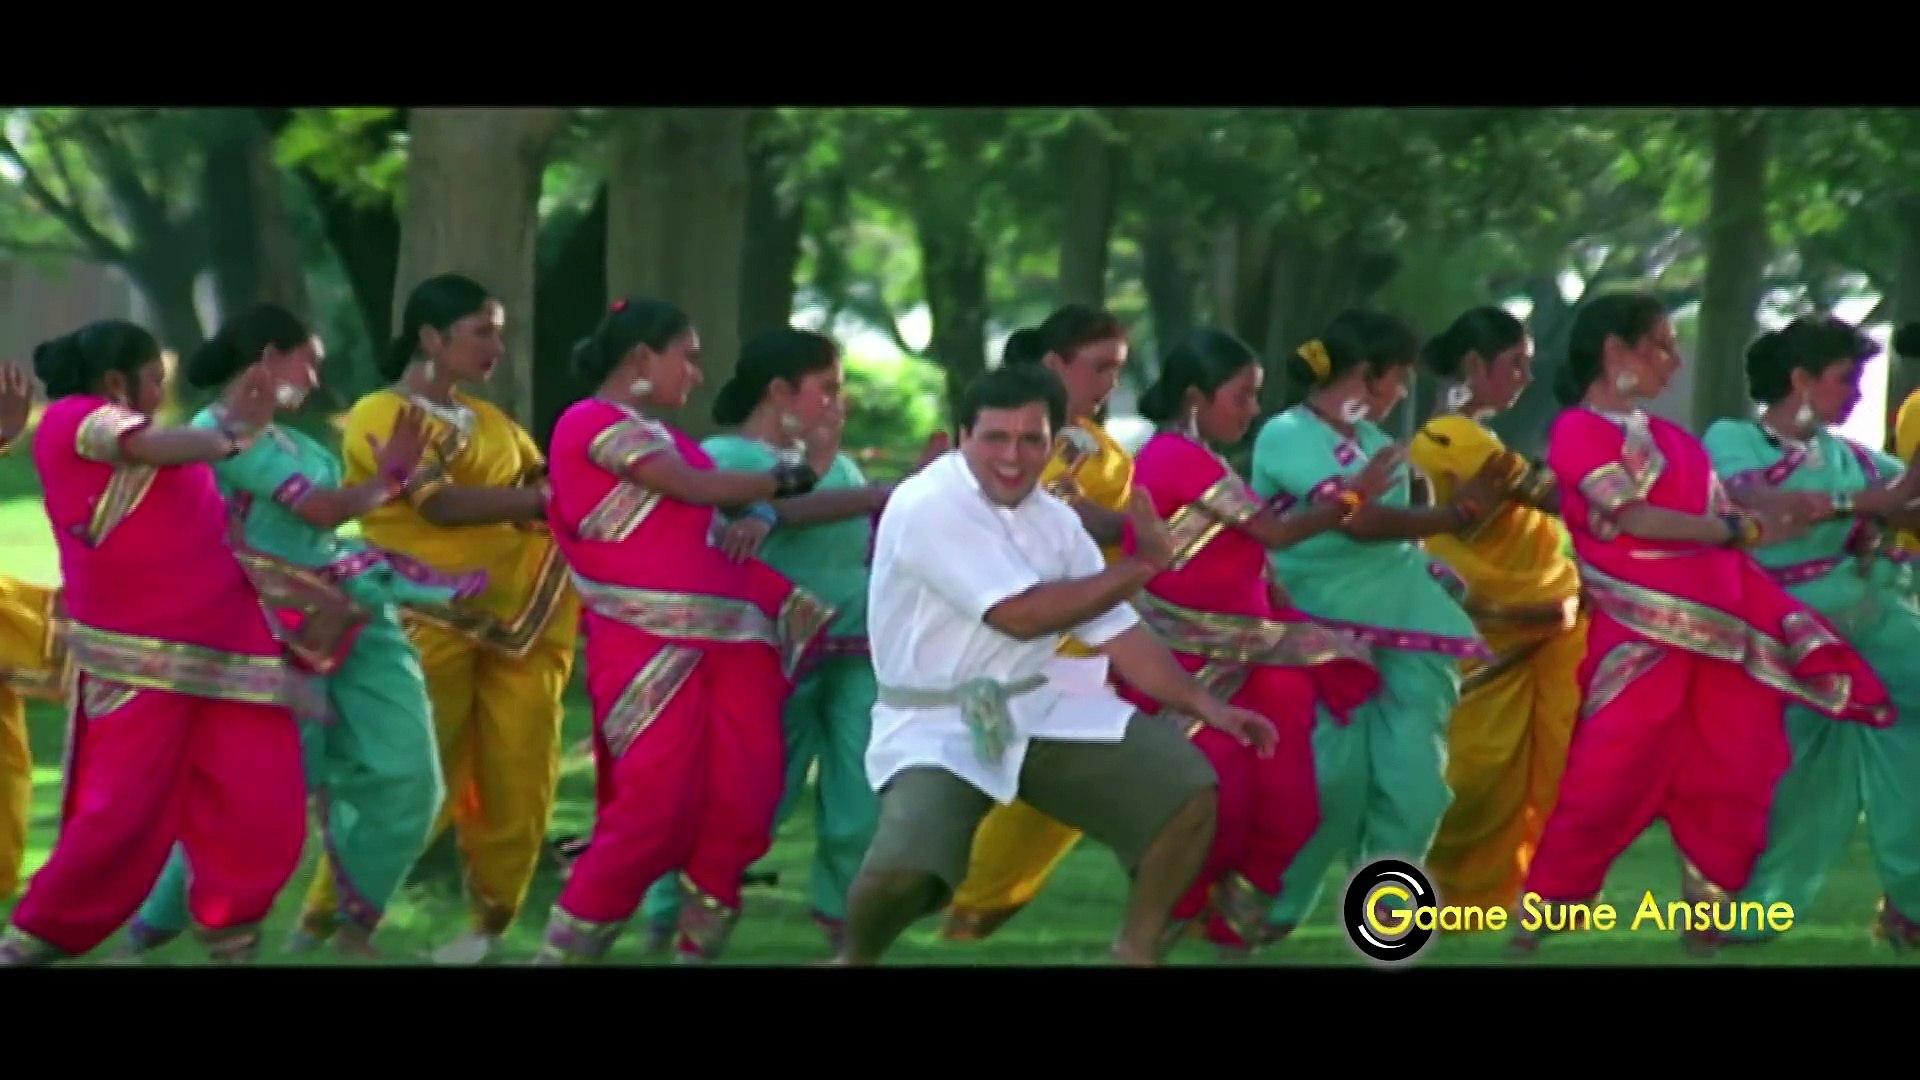 Tum Humpe Marte Ho Hum Tumpe Marte Hain | Vinod Rathod | Hero No.1 1997 Songs | Govinda